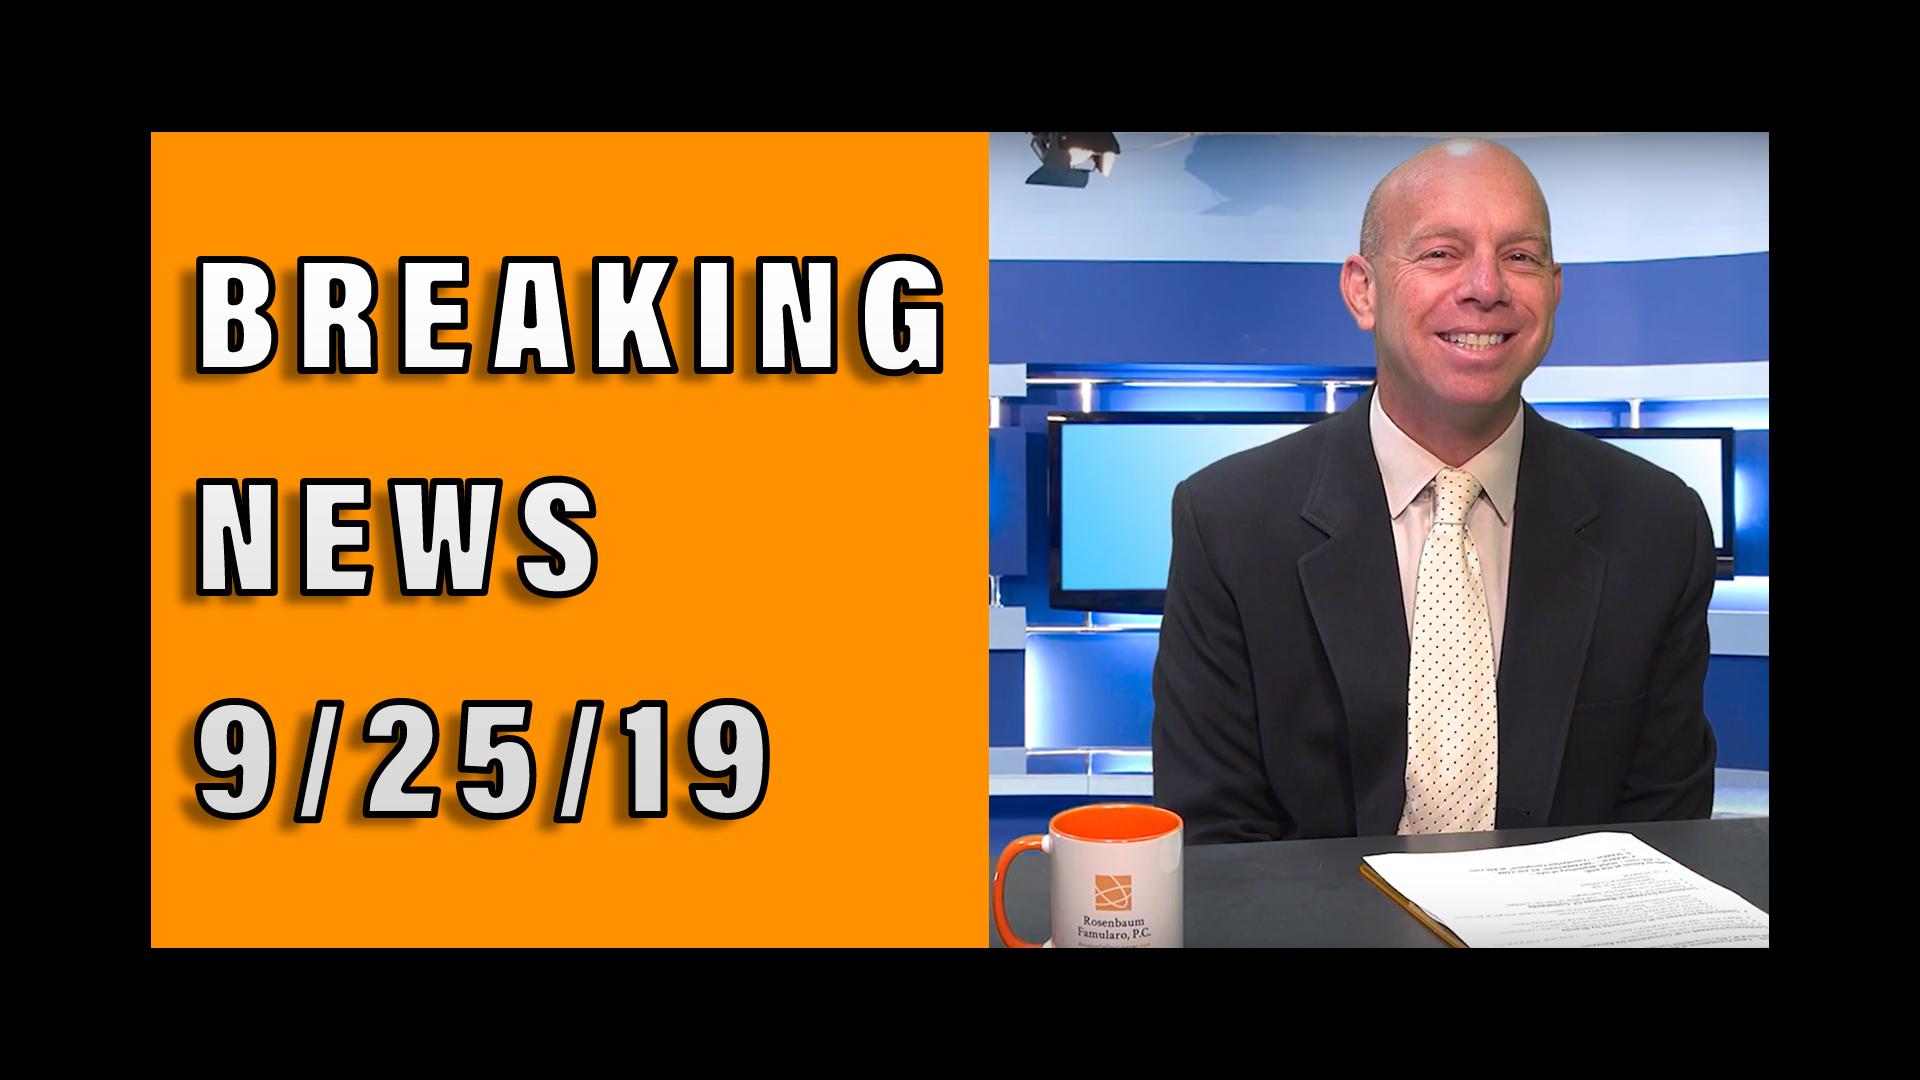 Amazon Sellers' Breaking News 9/25/19